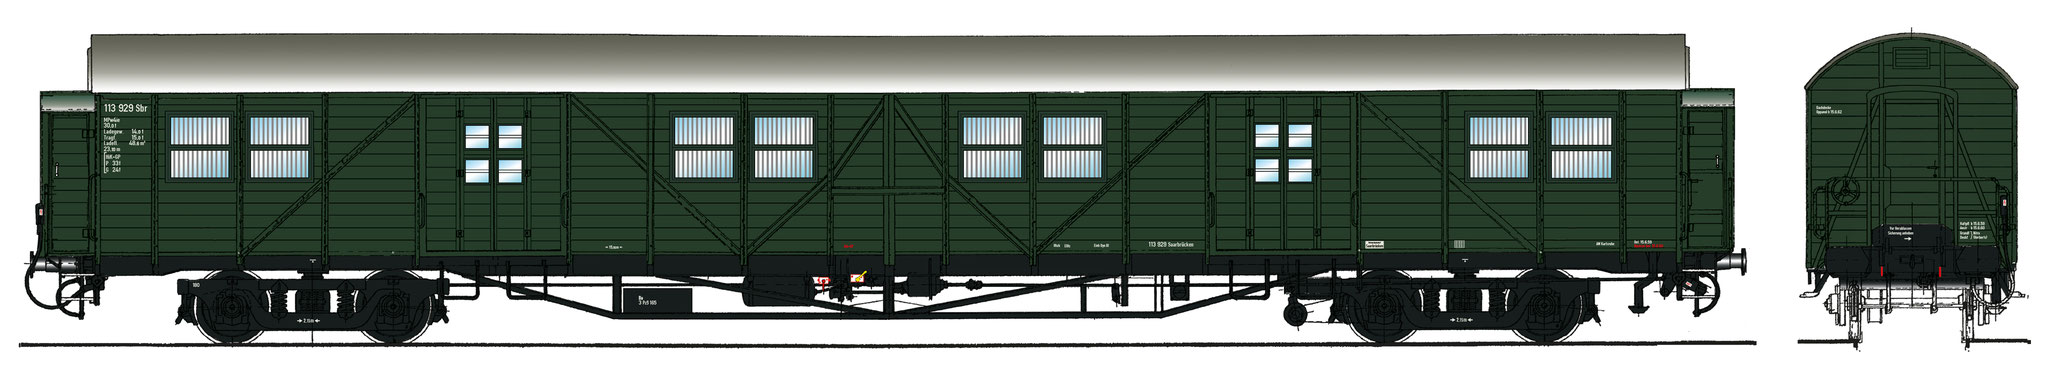 Spur 1 Gepäckwagen MPw4i-55, Epoche IIIb (Colorierung der Bestell-Nr. 16046)